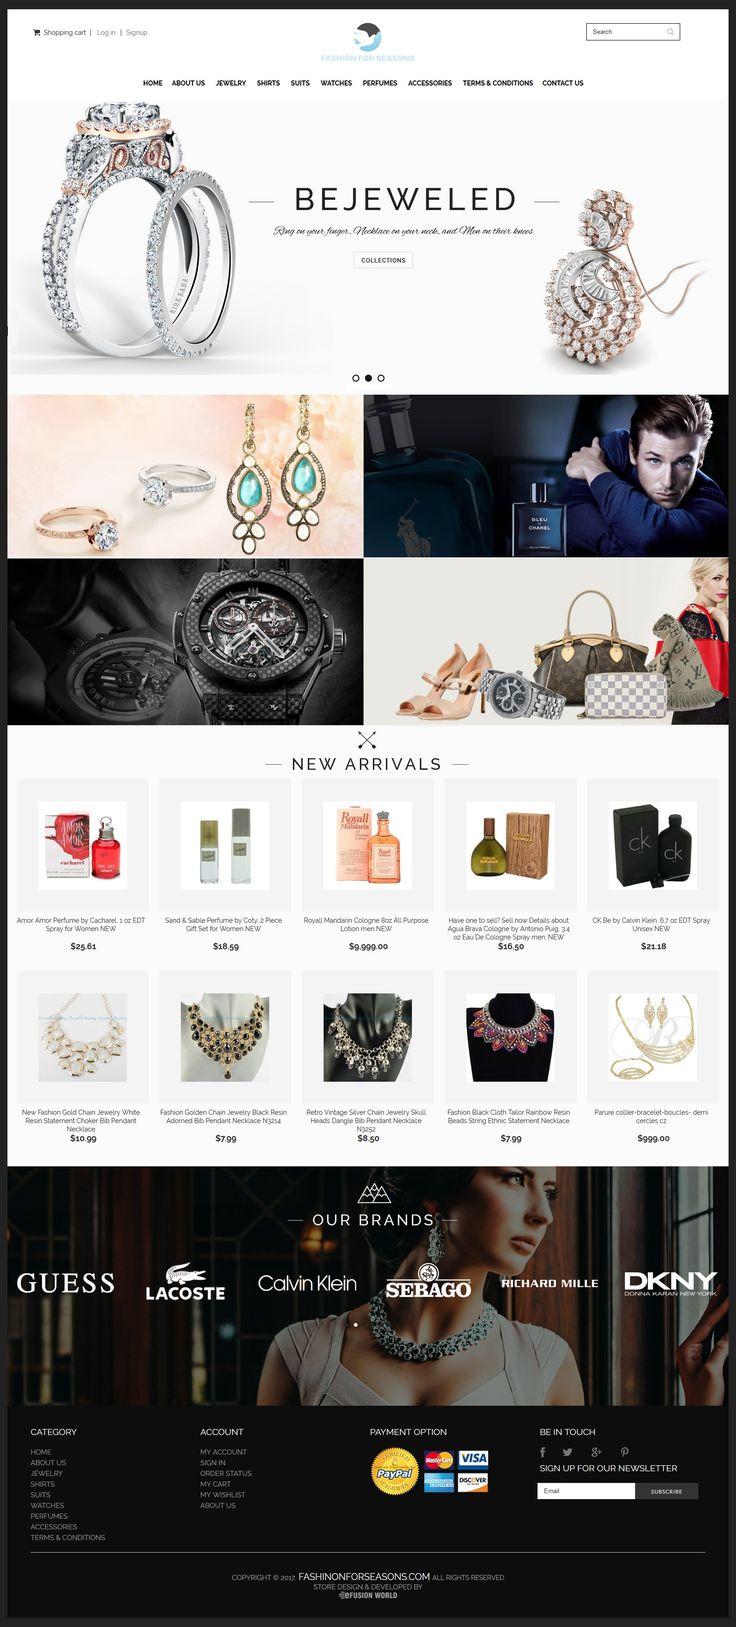 best seo company in india images on pinterest seo company seo